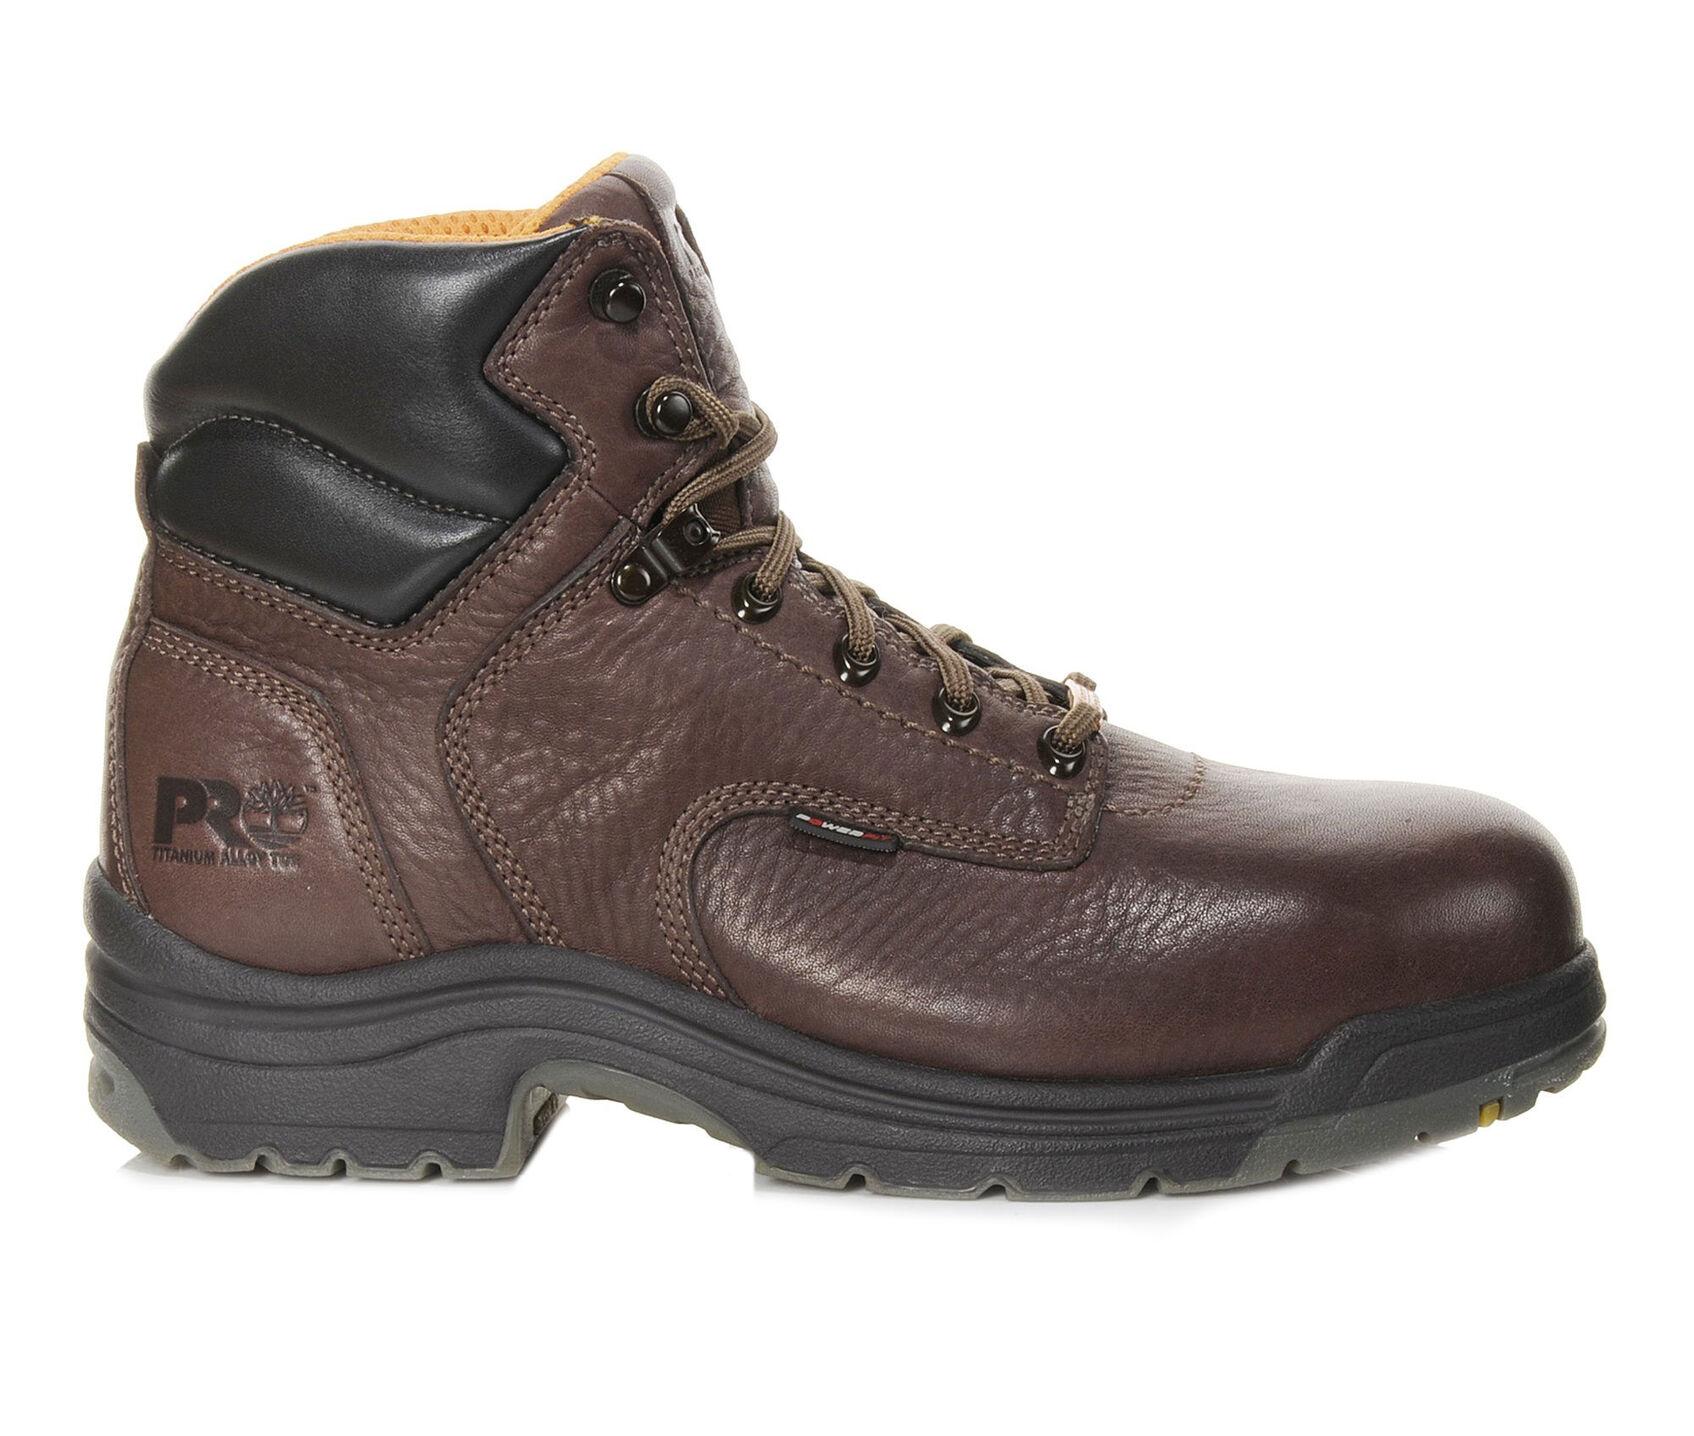 f0e49171e95 Men's Timberland Pro Titan 6in 26063 Alloy Toe Work Boots | Shoe ...